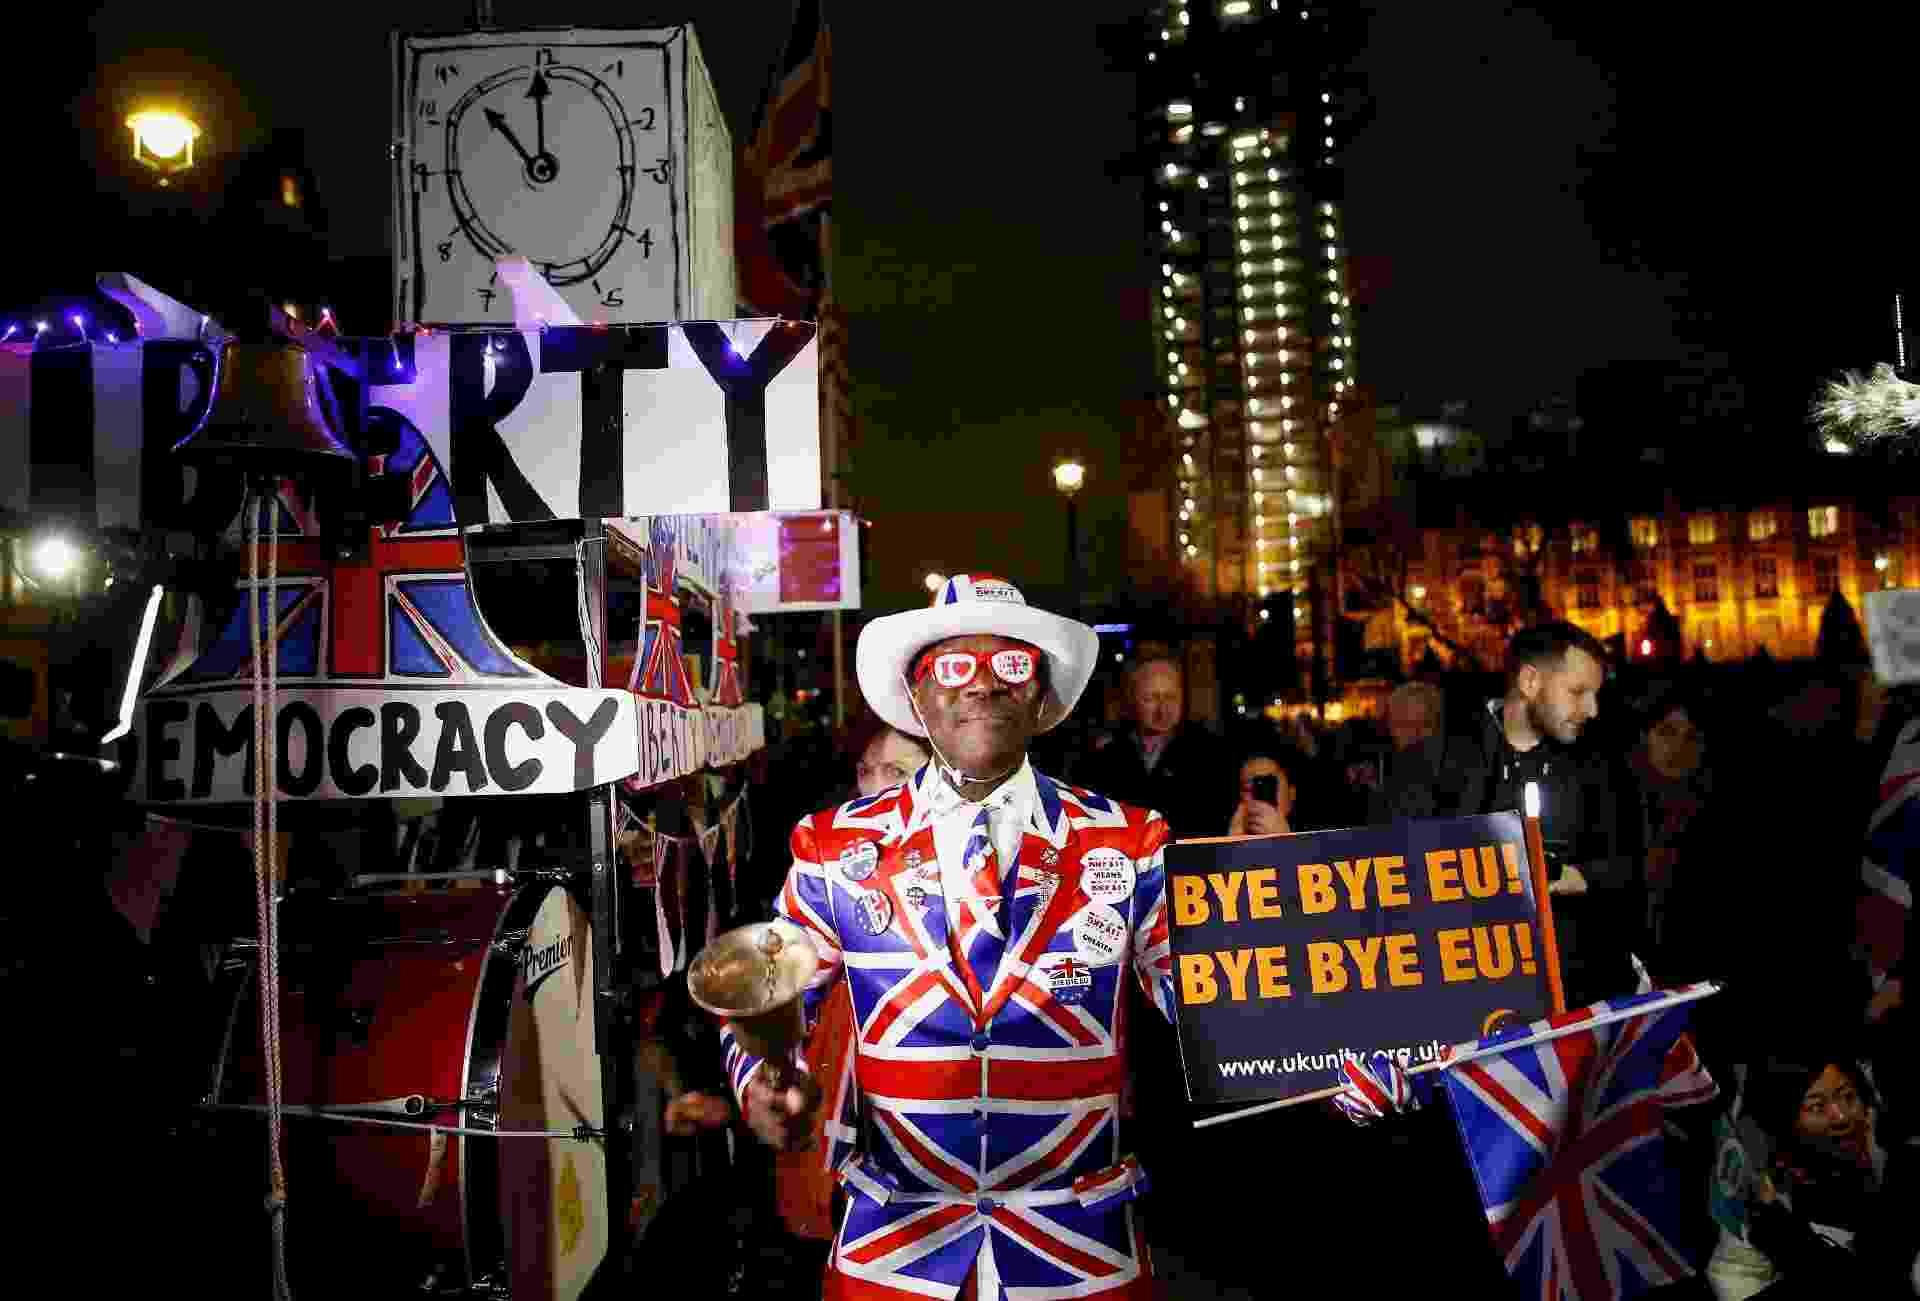 Manifestante fantasiado comemora Brexit nas ruas de Londres - Henry Nicholls/Reuters